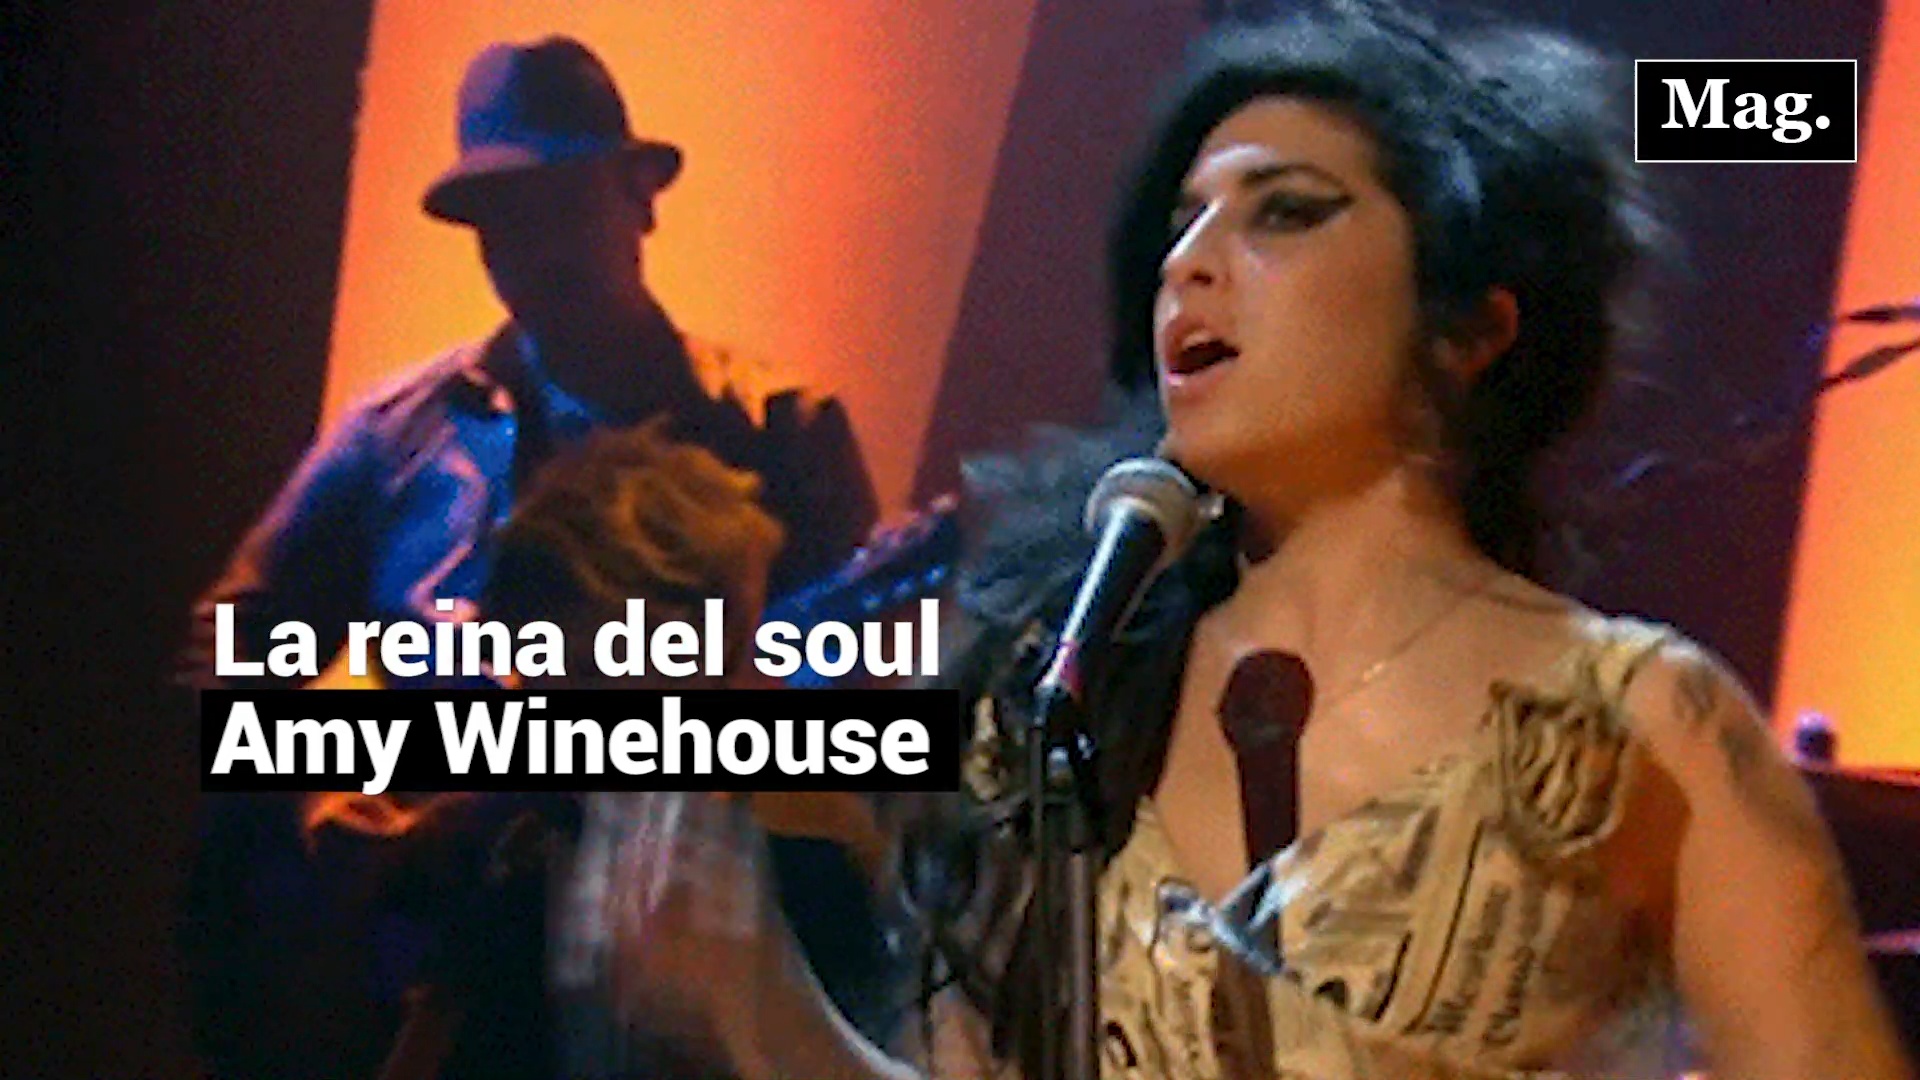 Amy Winehouse: La reina del soul